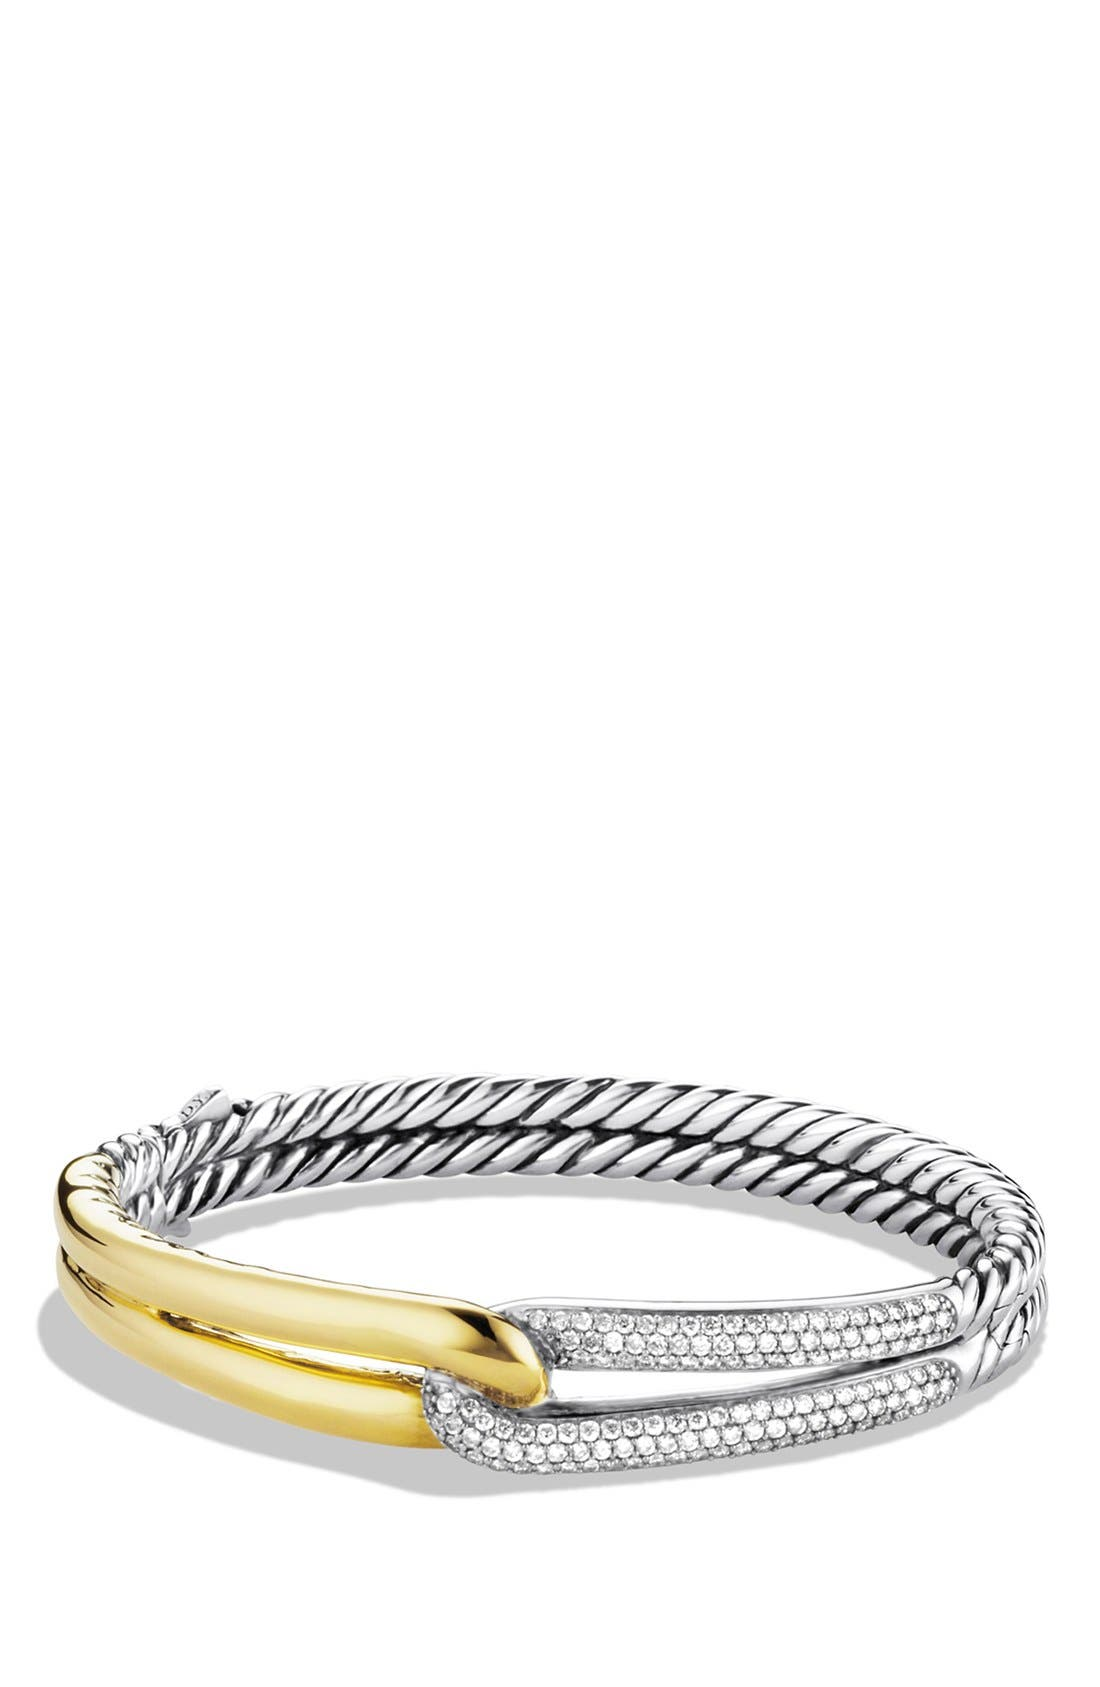 'Labyrinth' Single Loop Bracelet with Diamonds,                             Main thumbnail 1, color,                             Diamond